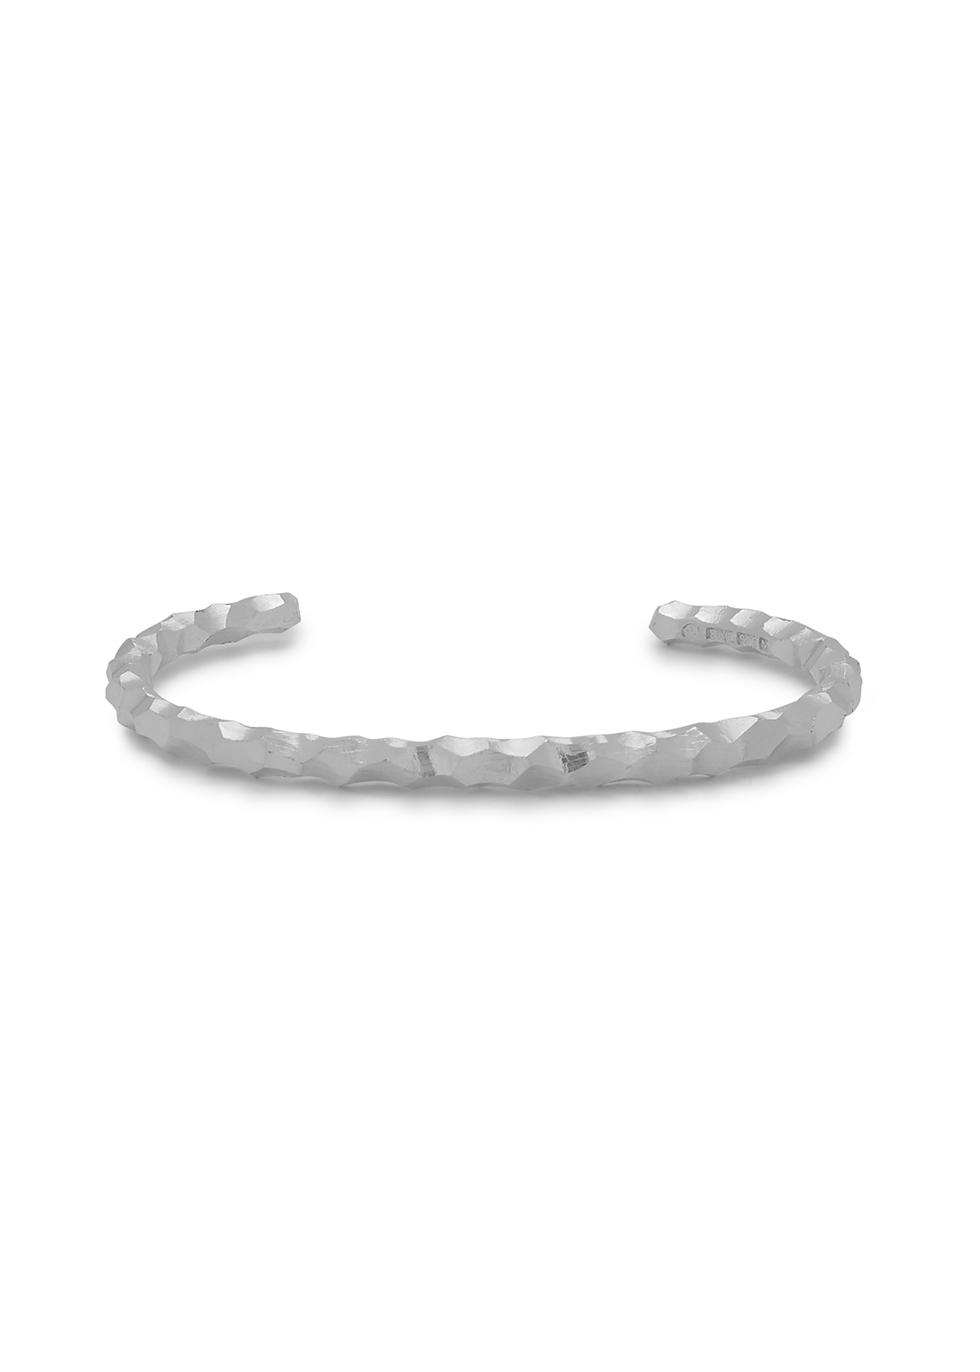 Snake sterling silver cuff bracelet